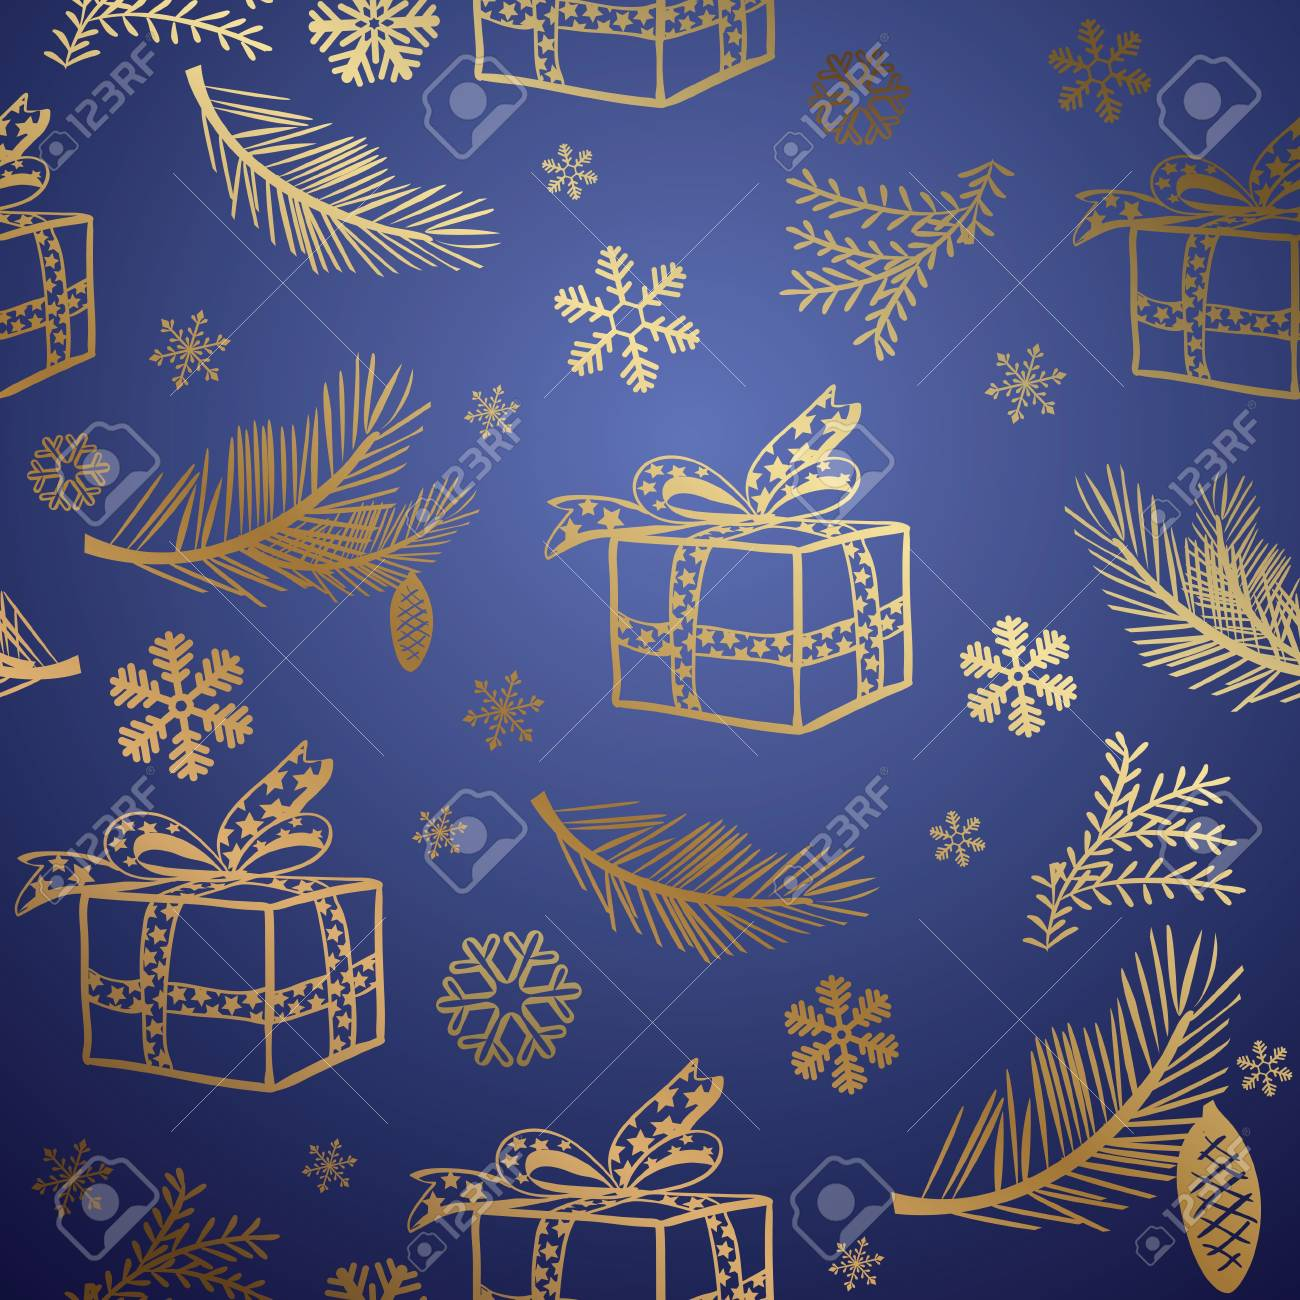 Seamless christmas background. Design element. Stock Vector - 10841663